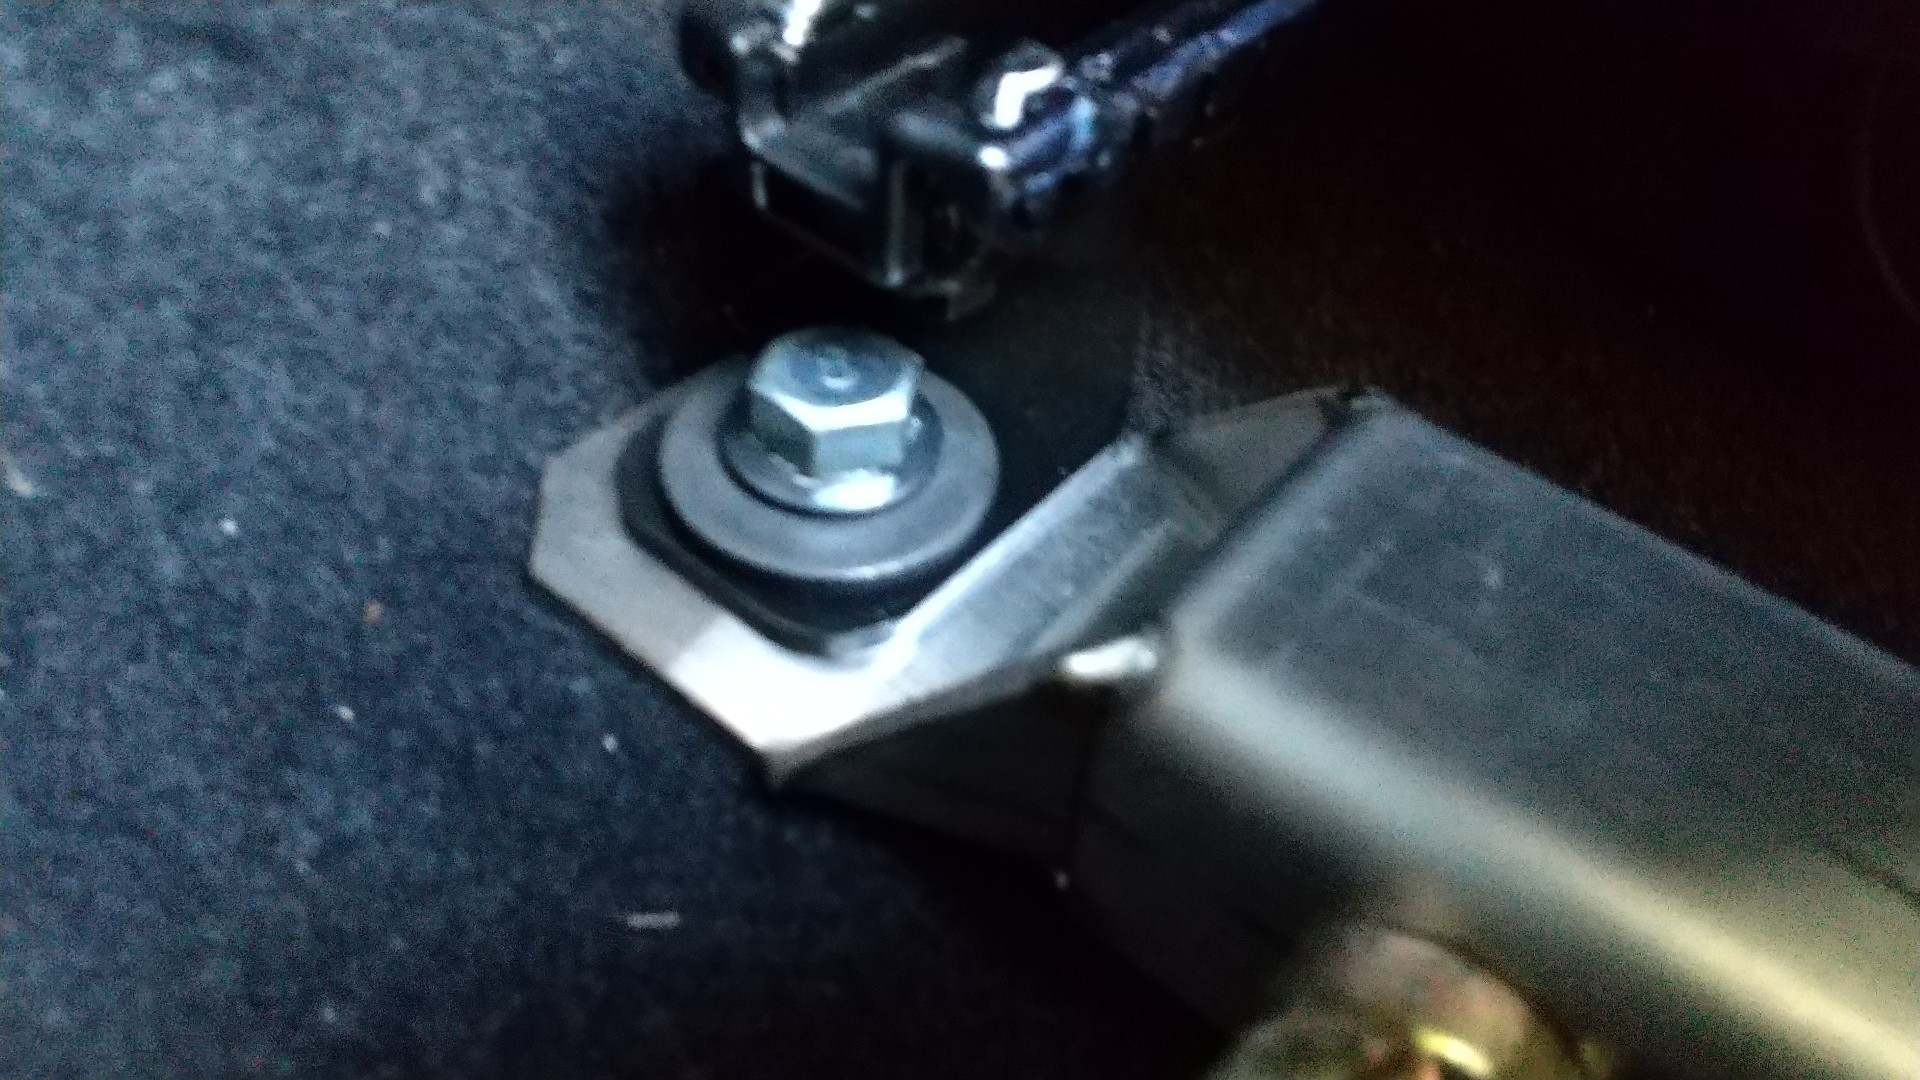 HPIコンペティションギアフロアーバー取り付け